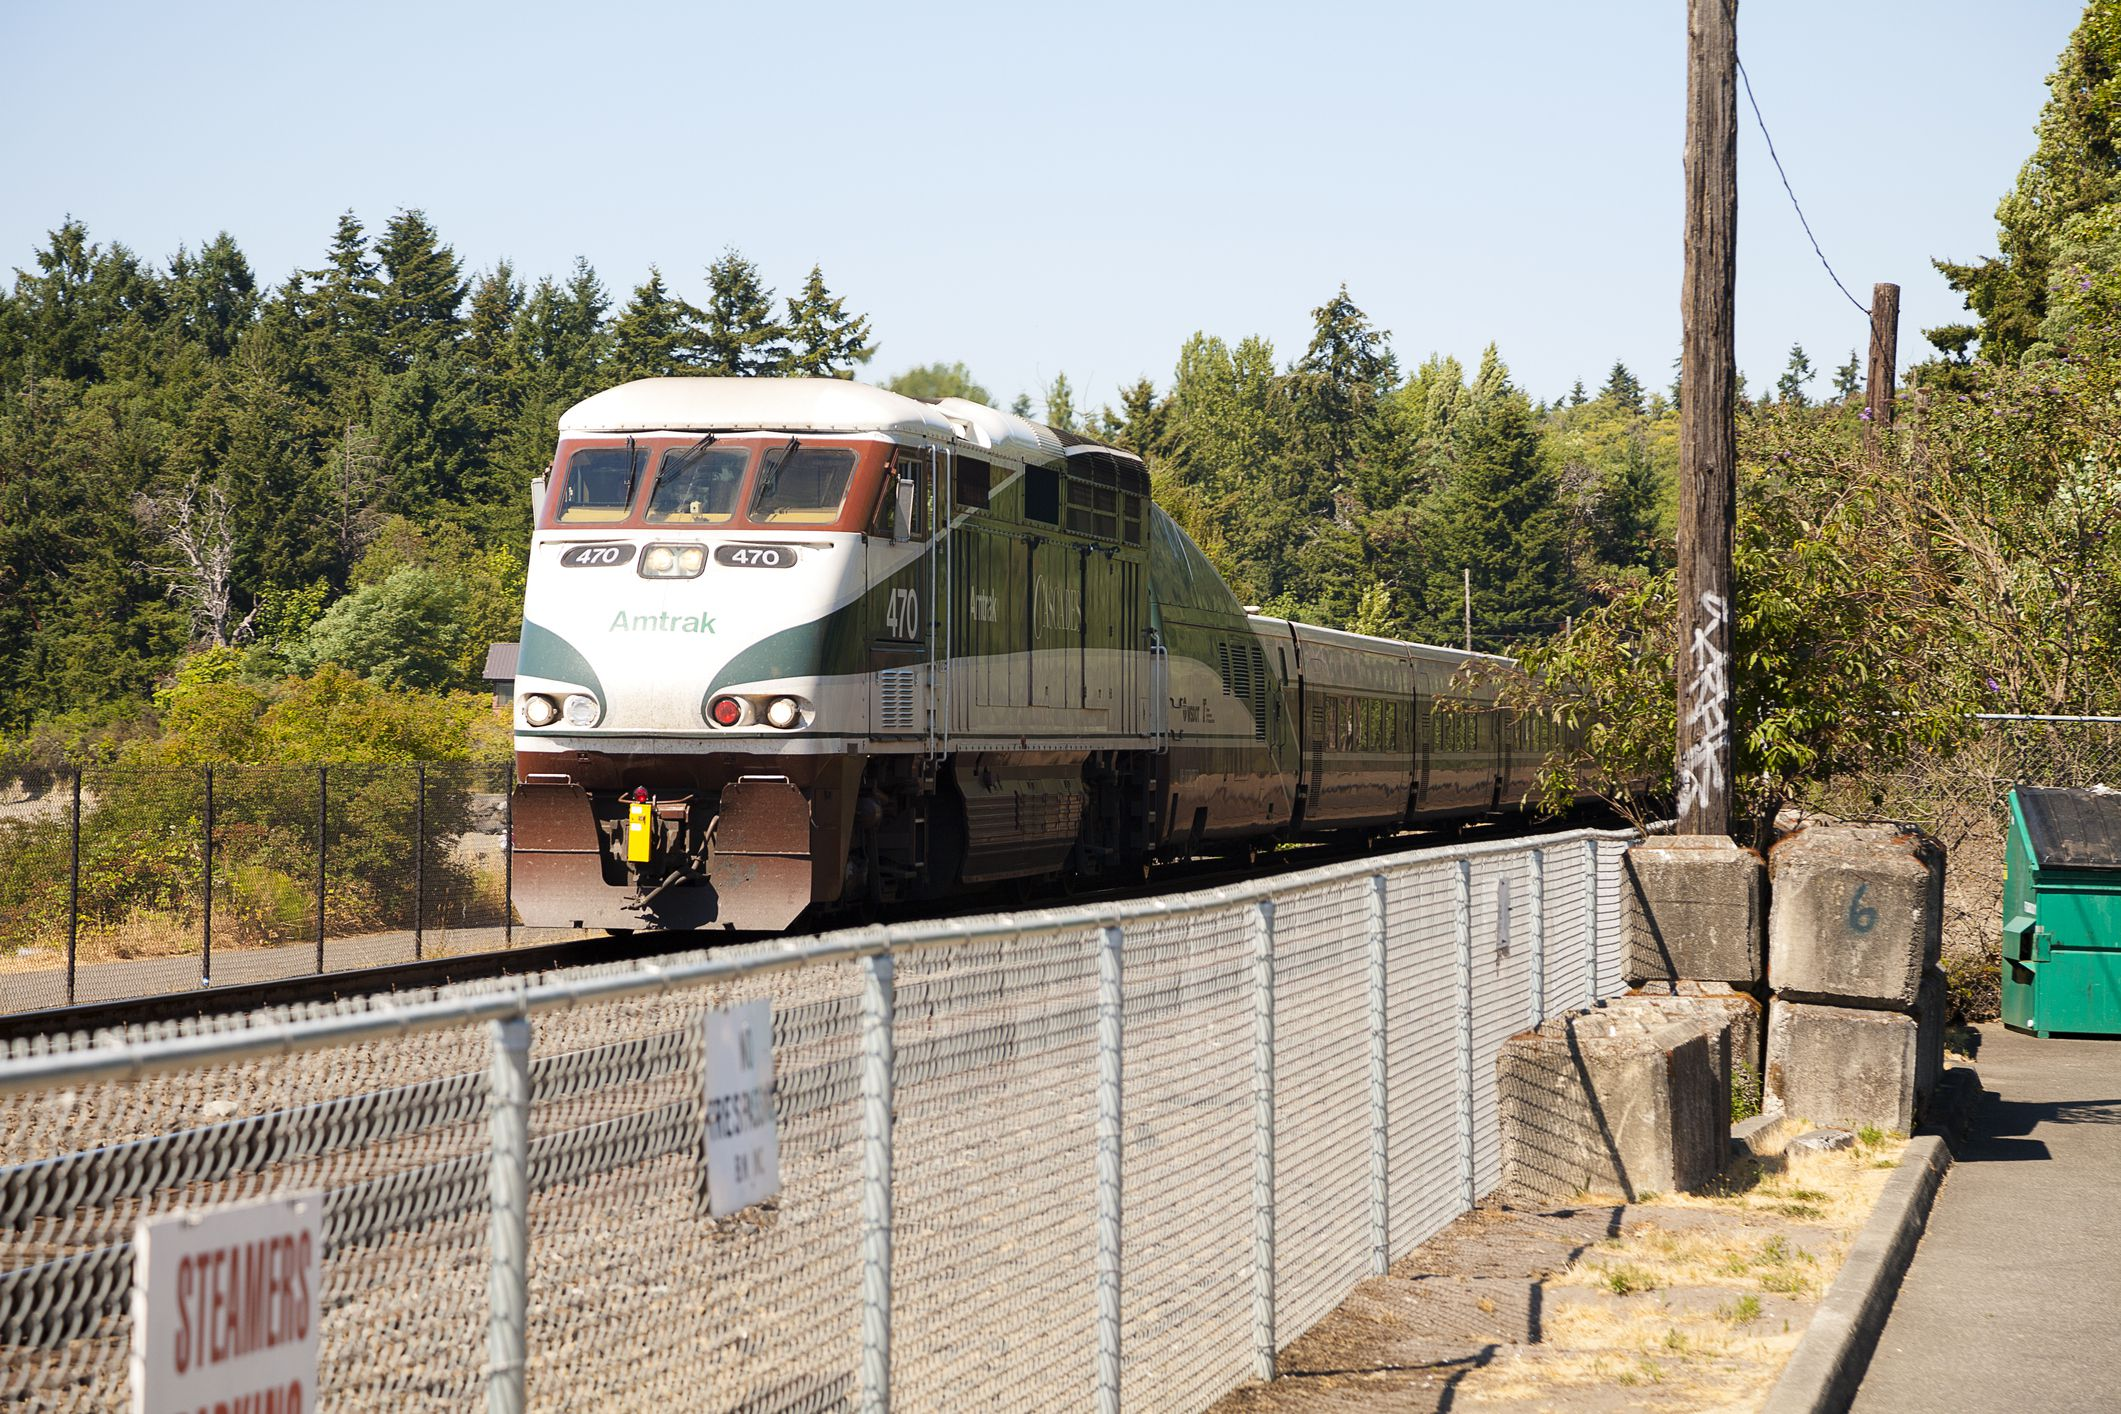 Tren de Seattle, WA a Vancouver, BC